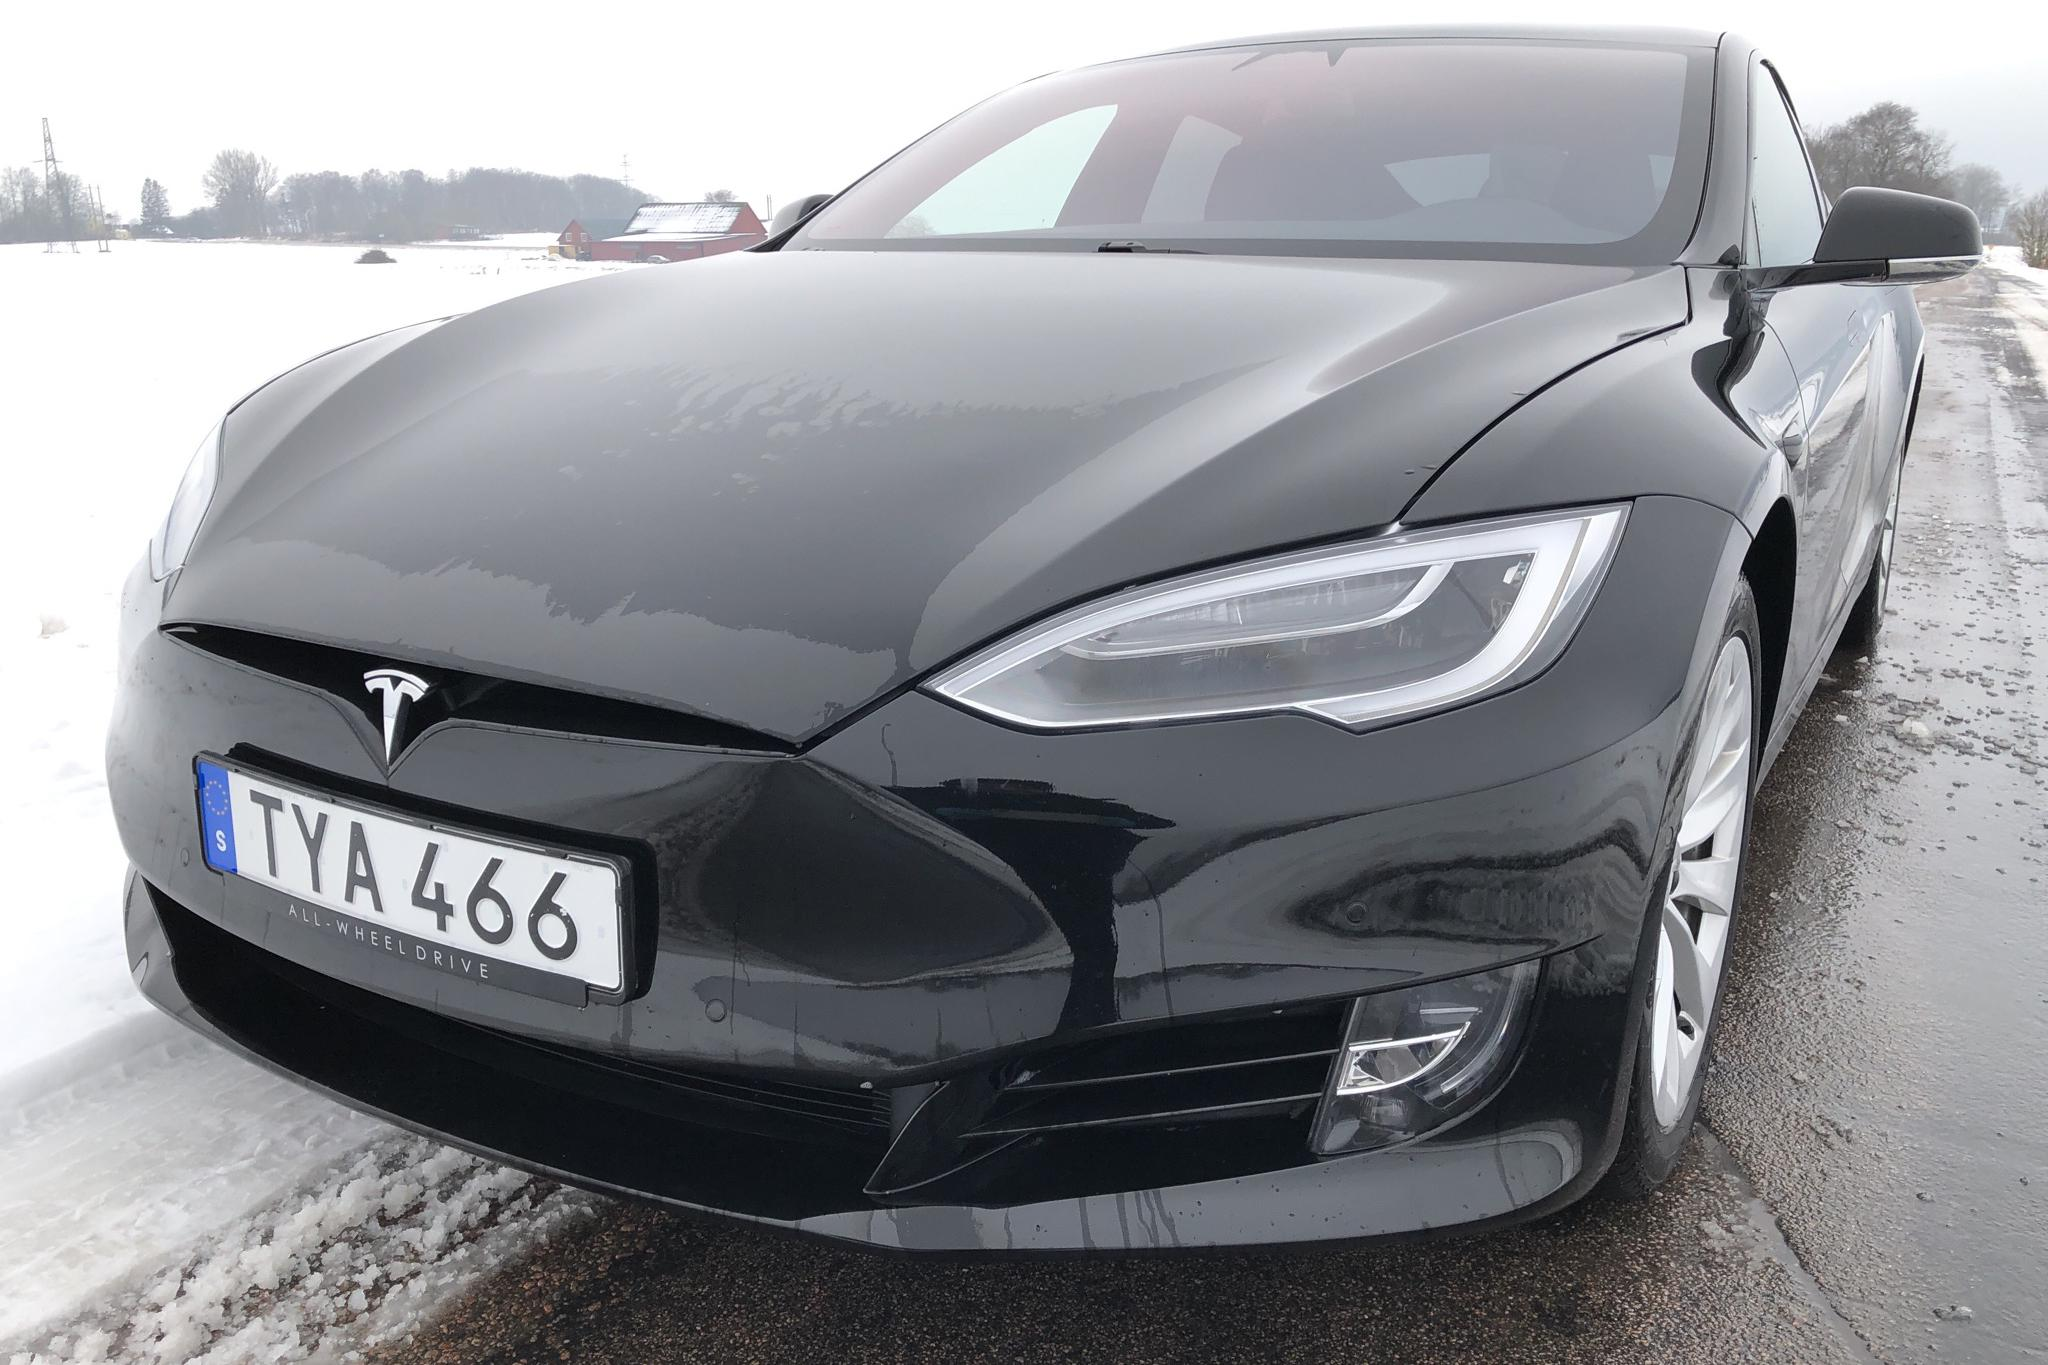 Tesla Model S 75D (525hk) - 59 310 km - Automatic - black - 2018